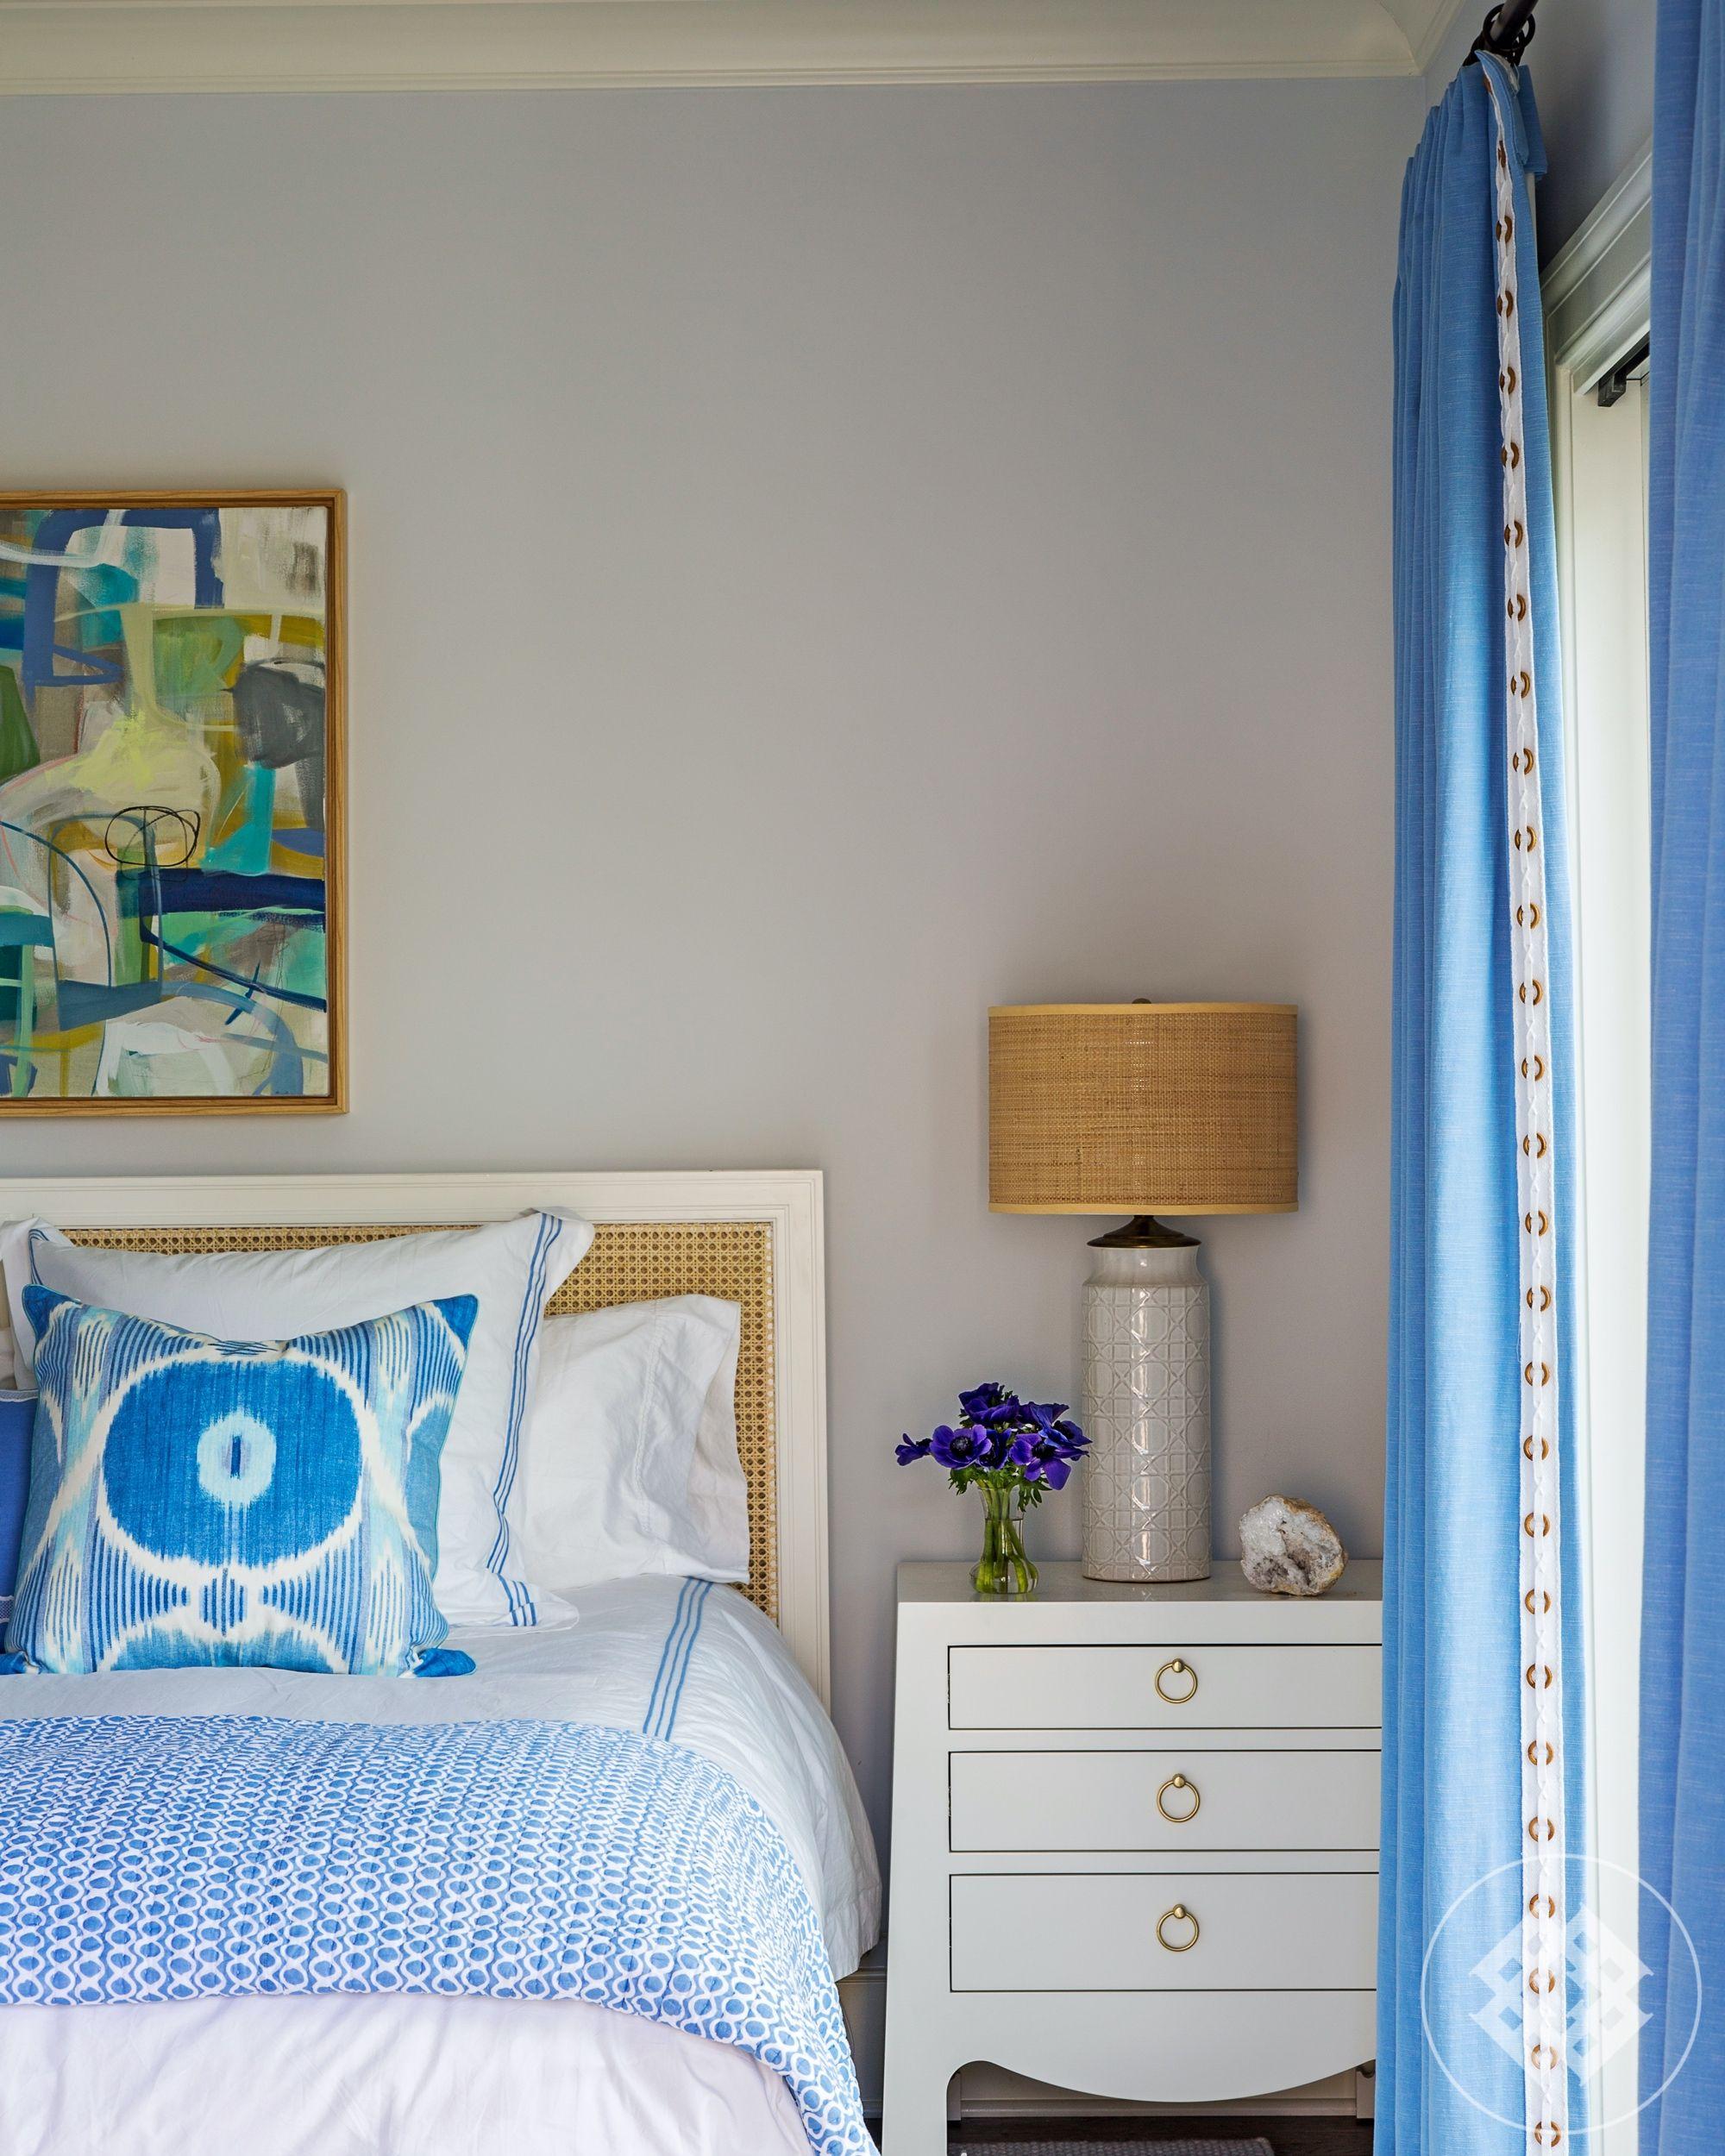 Blue bedroom, white side table, vintage lamp, burlap shad